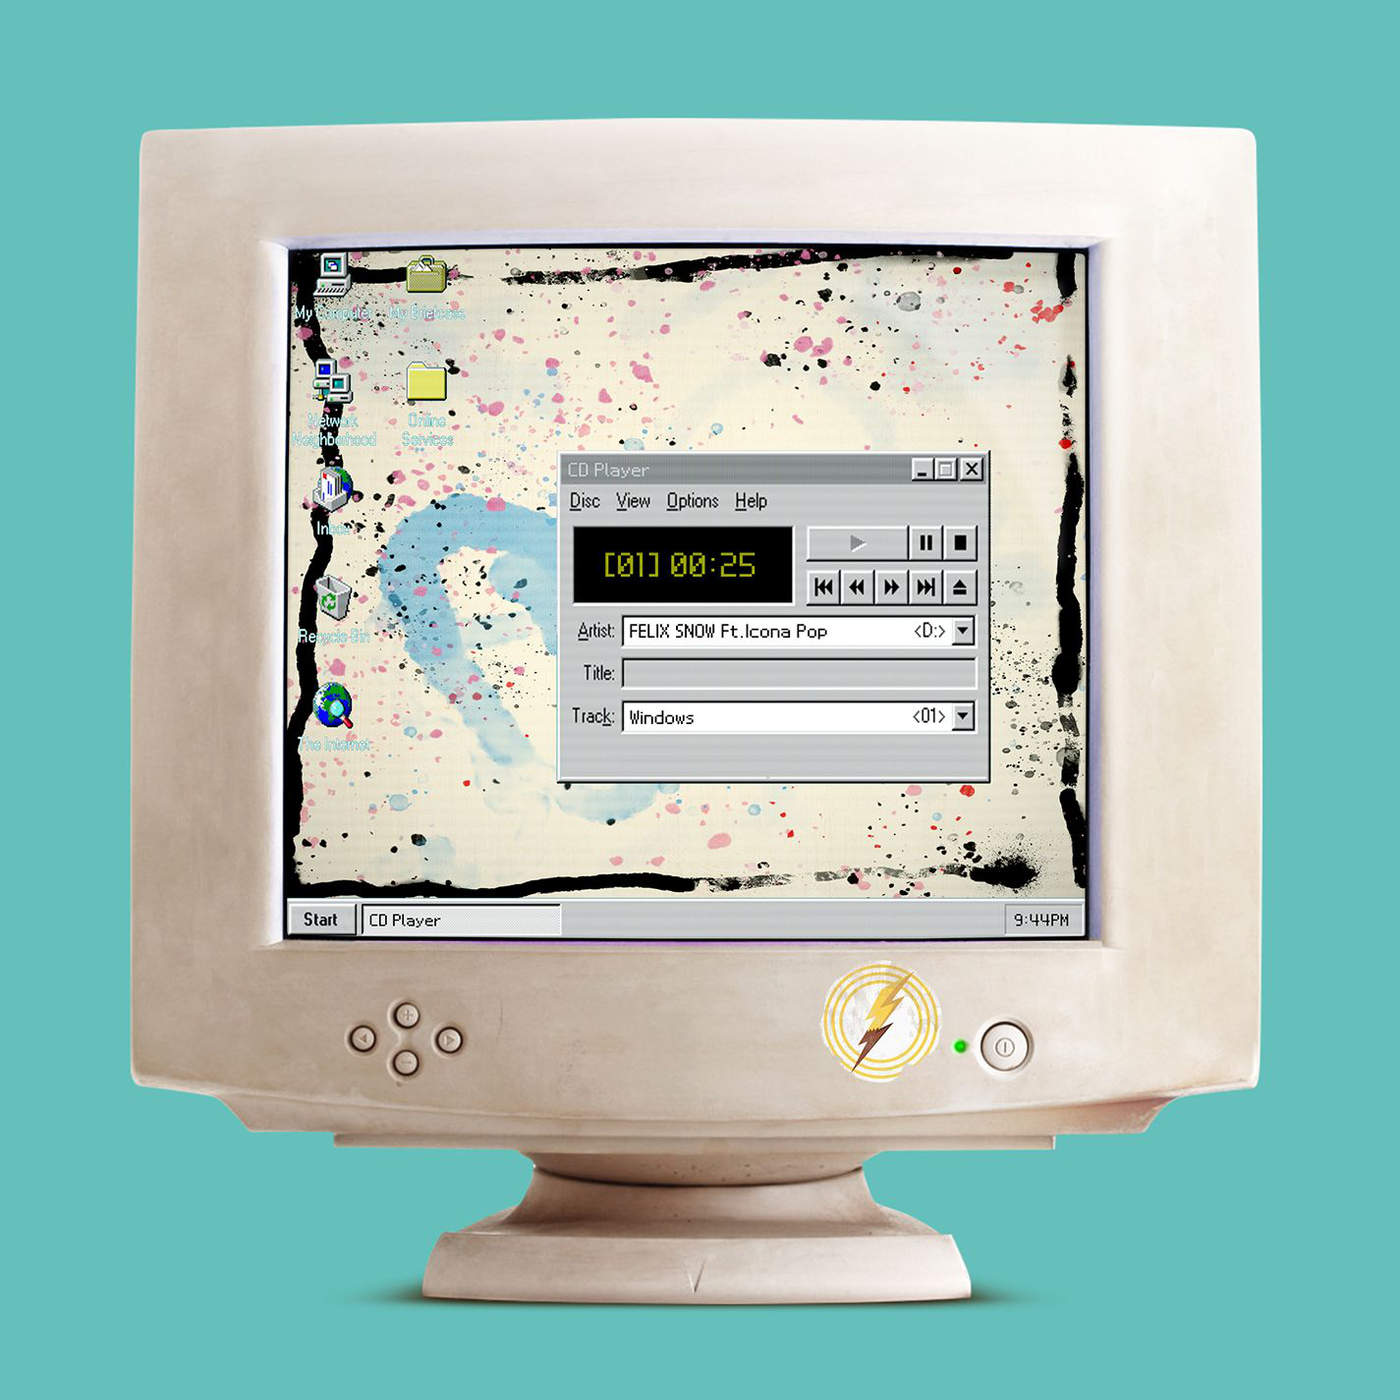 Felix Snow - Windows (feat. Icona Pop) - Single Cover